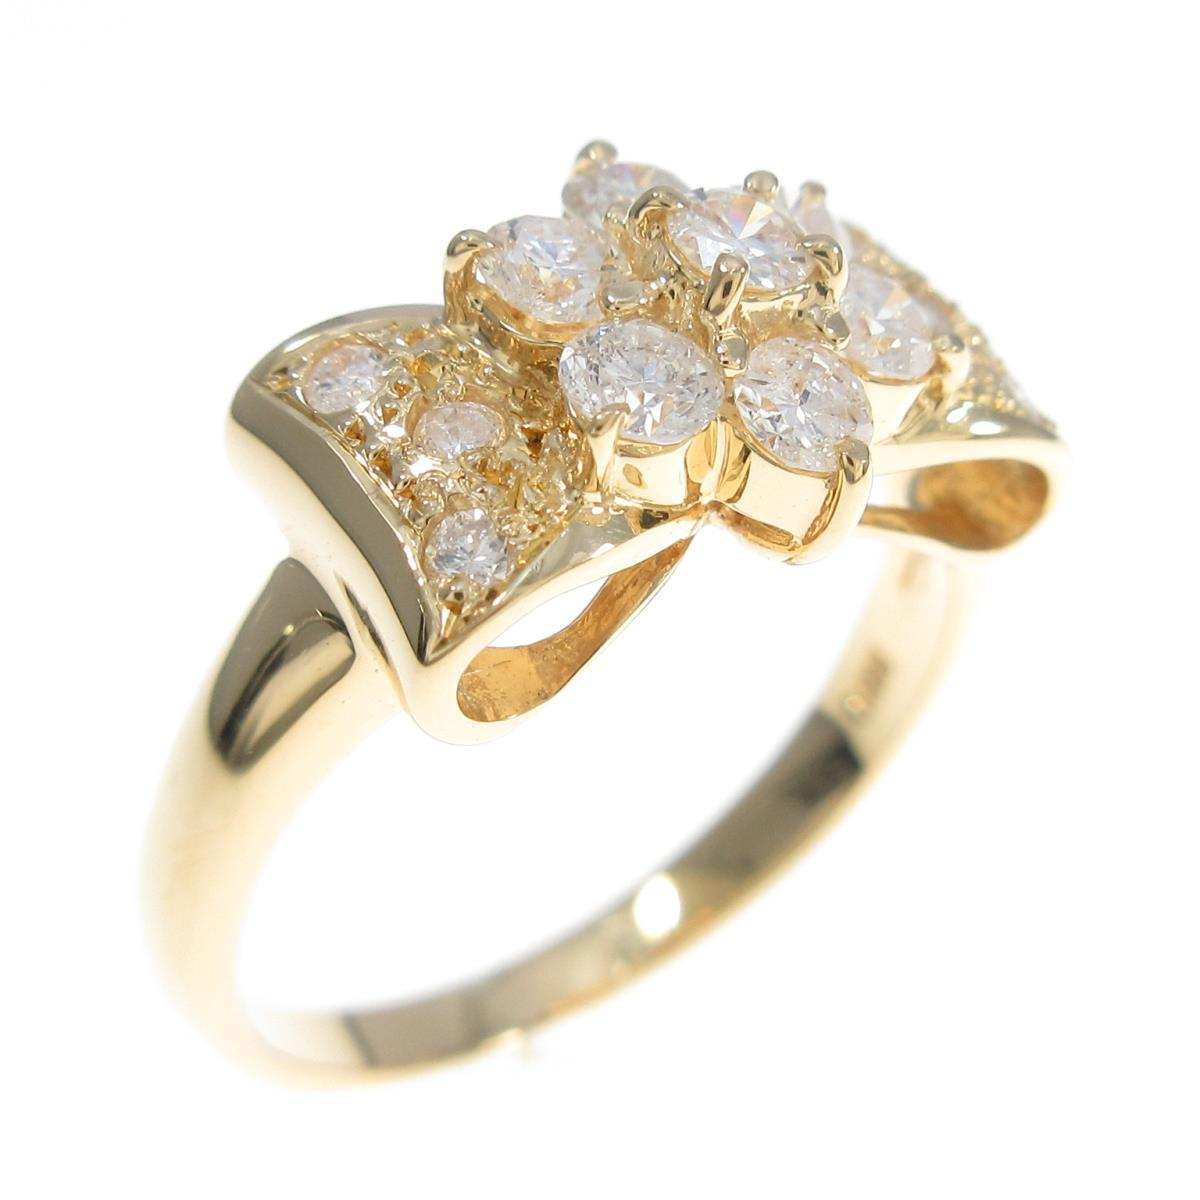 K18YG フラワー×リボン ダイヤモンドリング【中古】